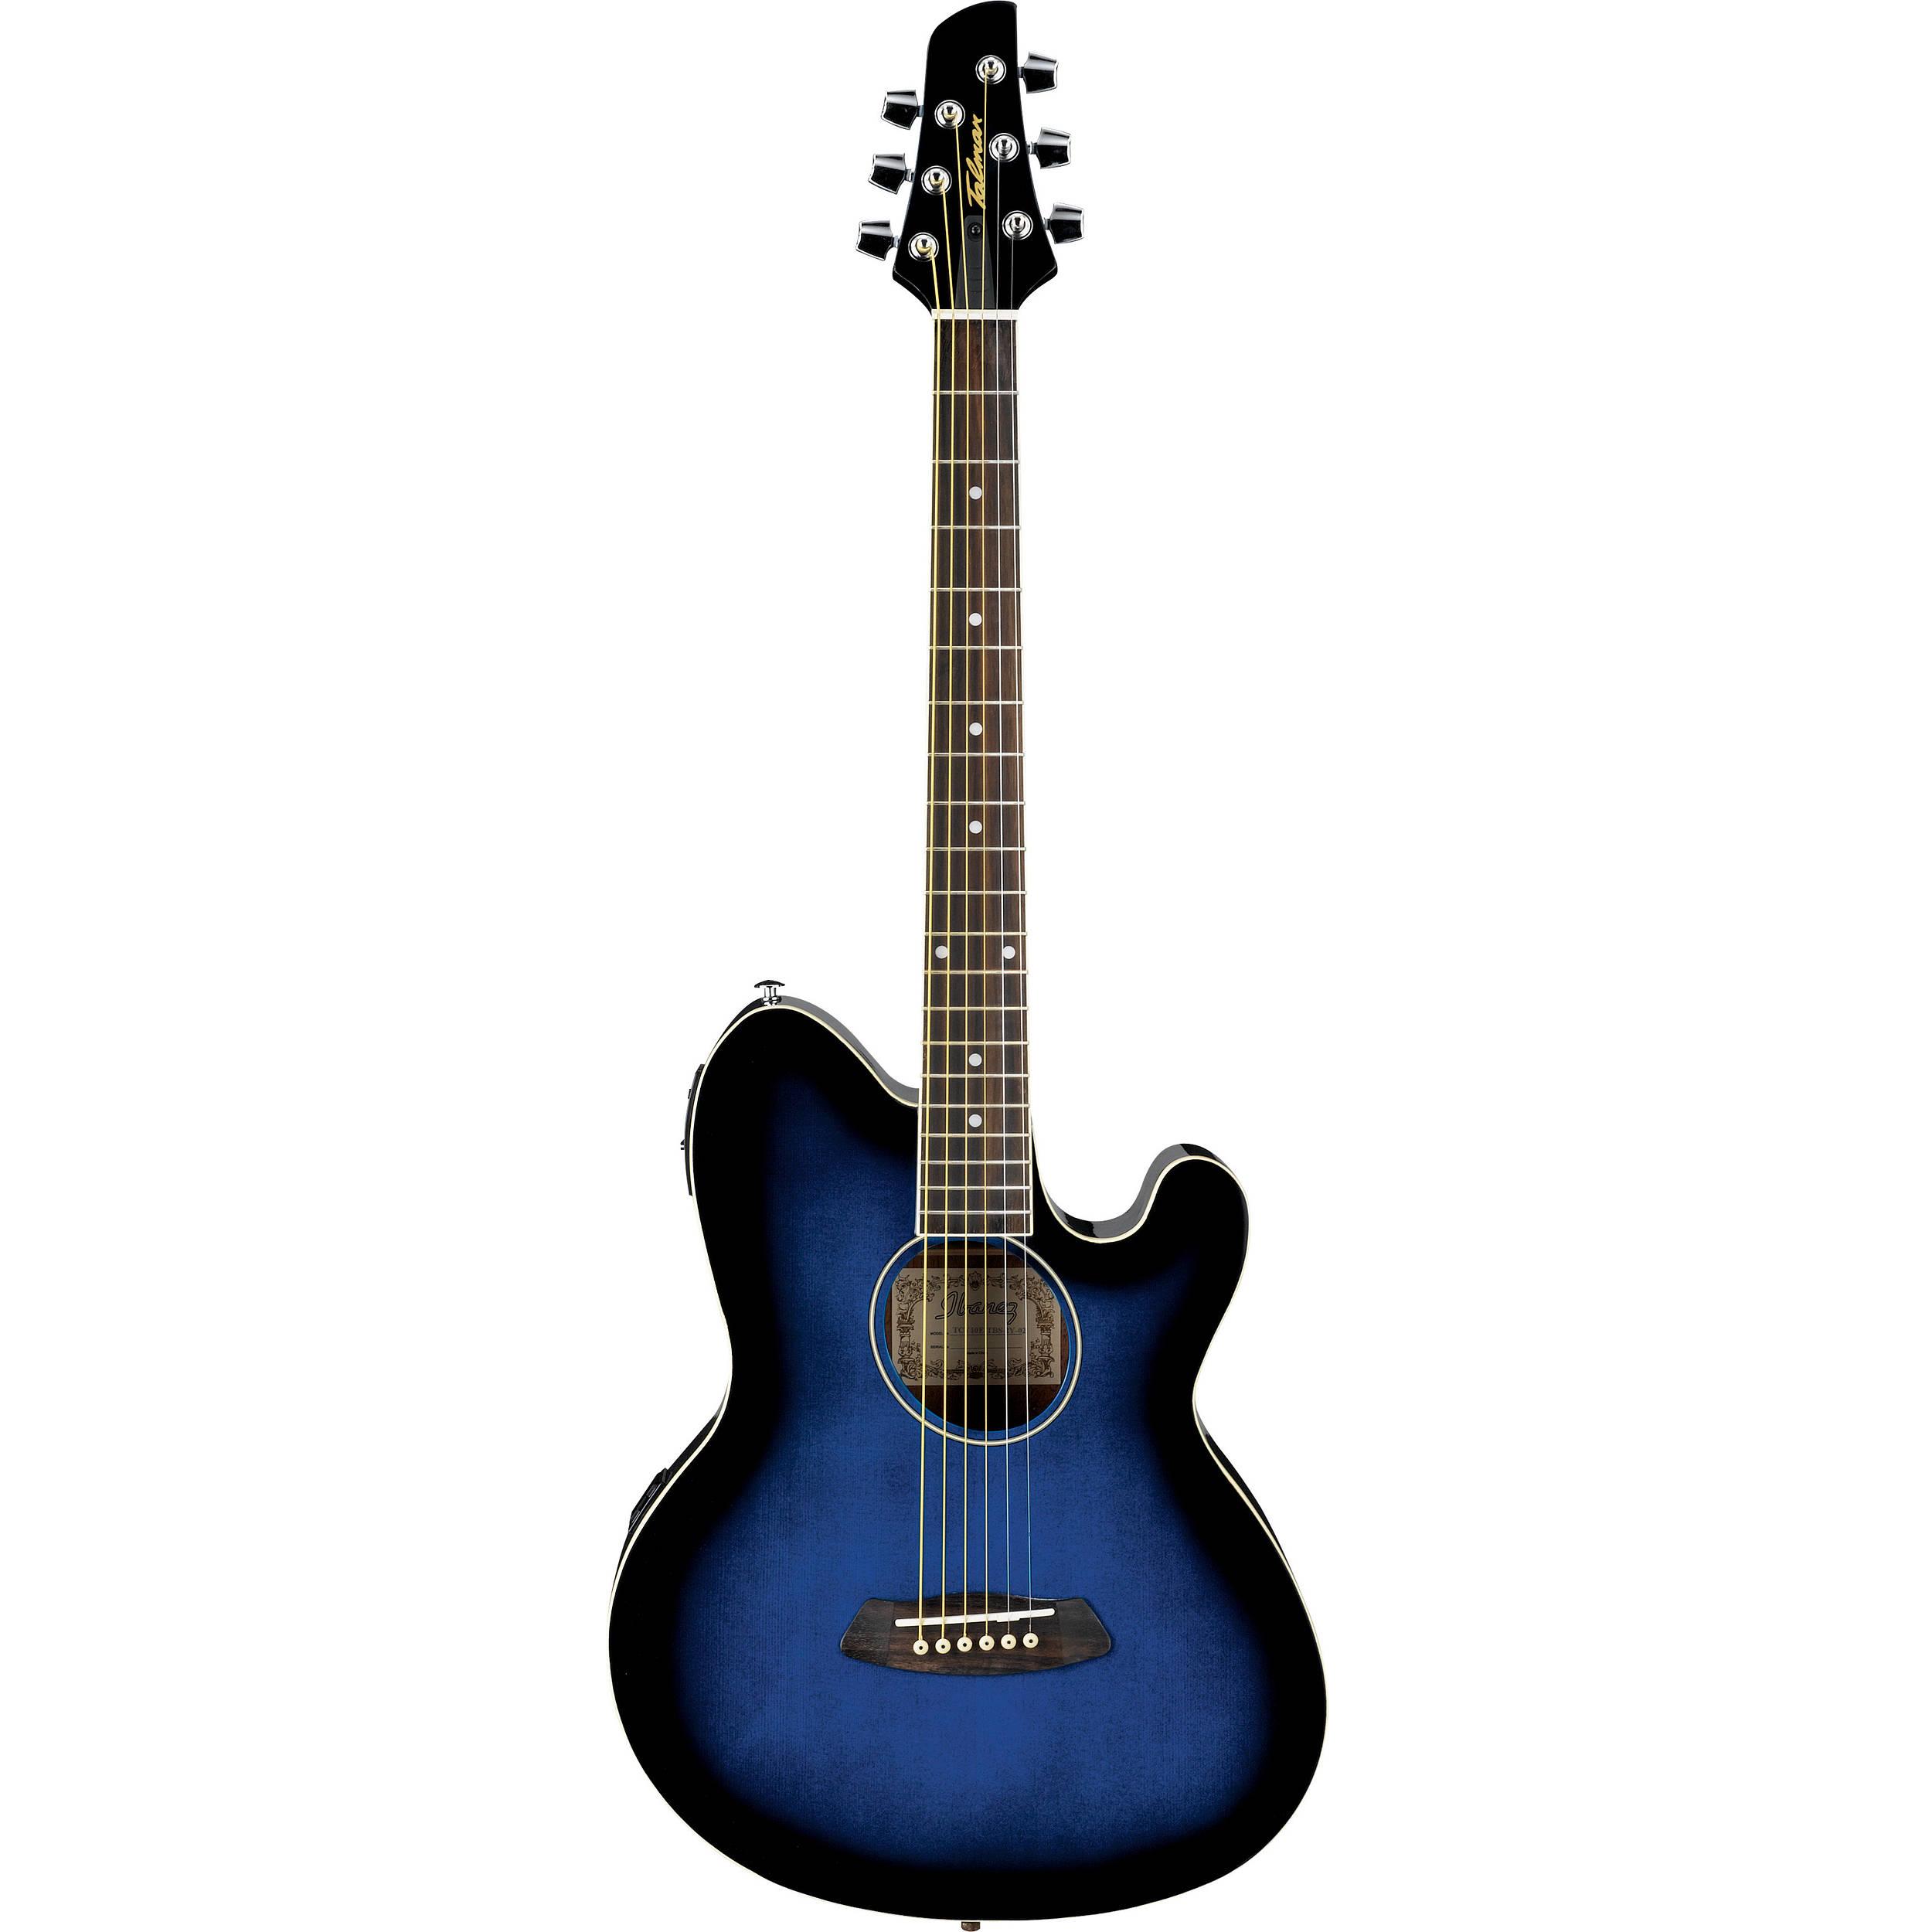 Ibanez Tcy10e Talman Series Acoustic Electric Guitar Tcy10etbs